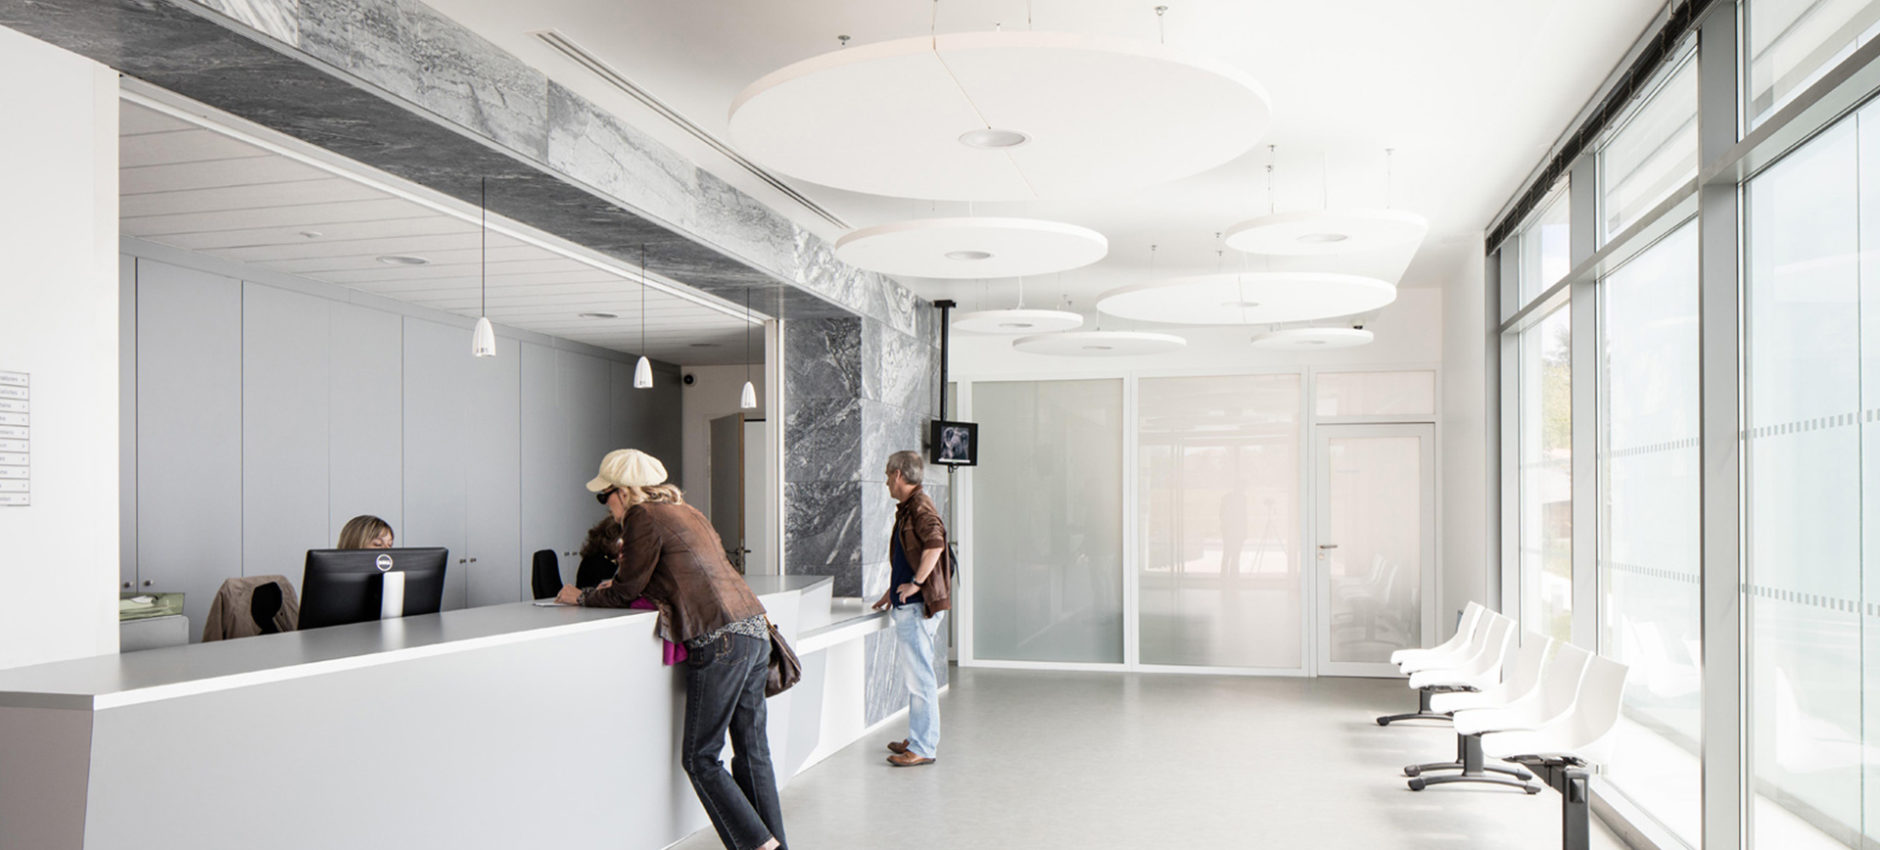 boca_architecture_projet_maison_sante_blaye_03.jpg